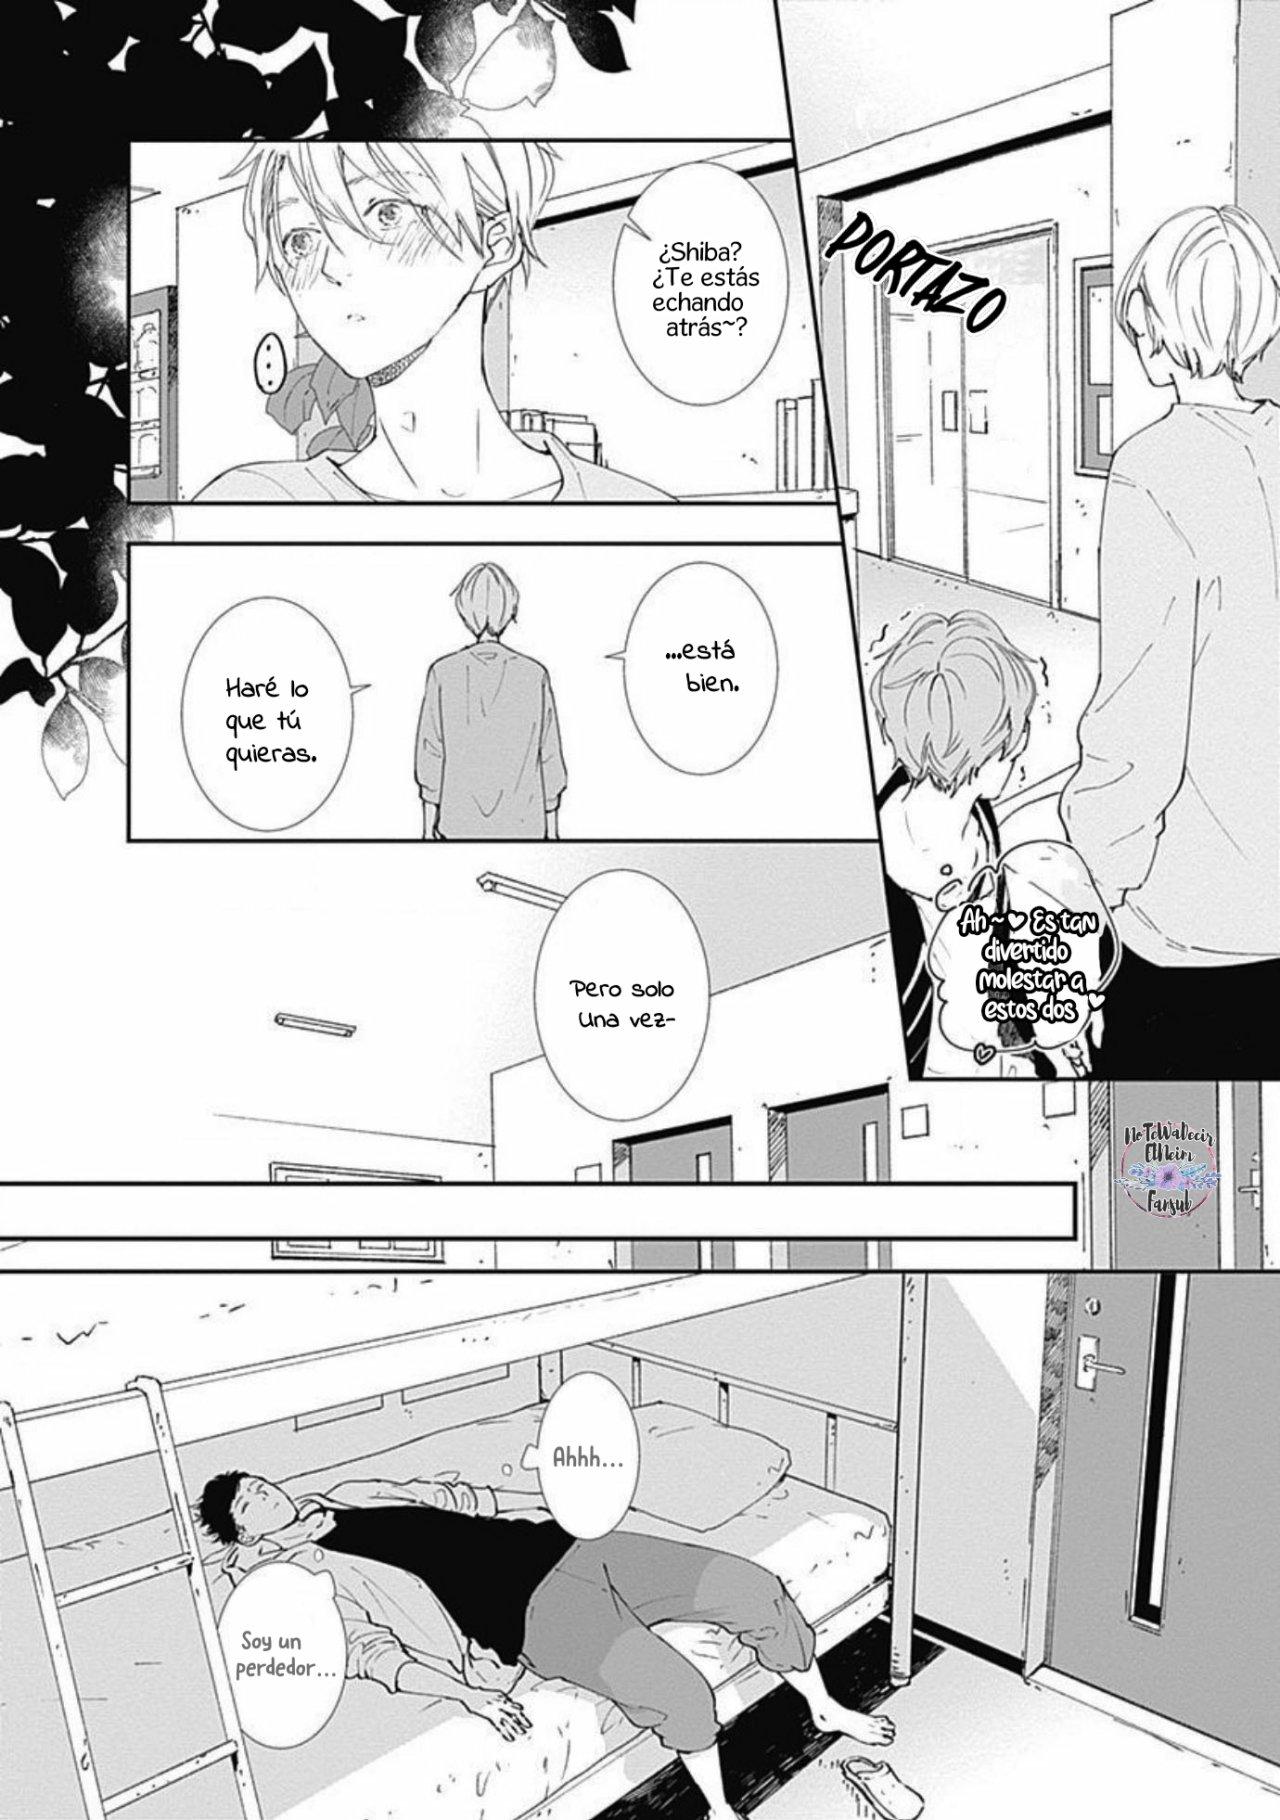 https://nine.mangadogs.com/es_manga/pic8/12/36684/946997/22b8372a37b2818e494fd9b18c25290d.jpg Page 37